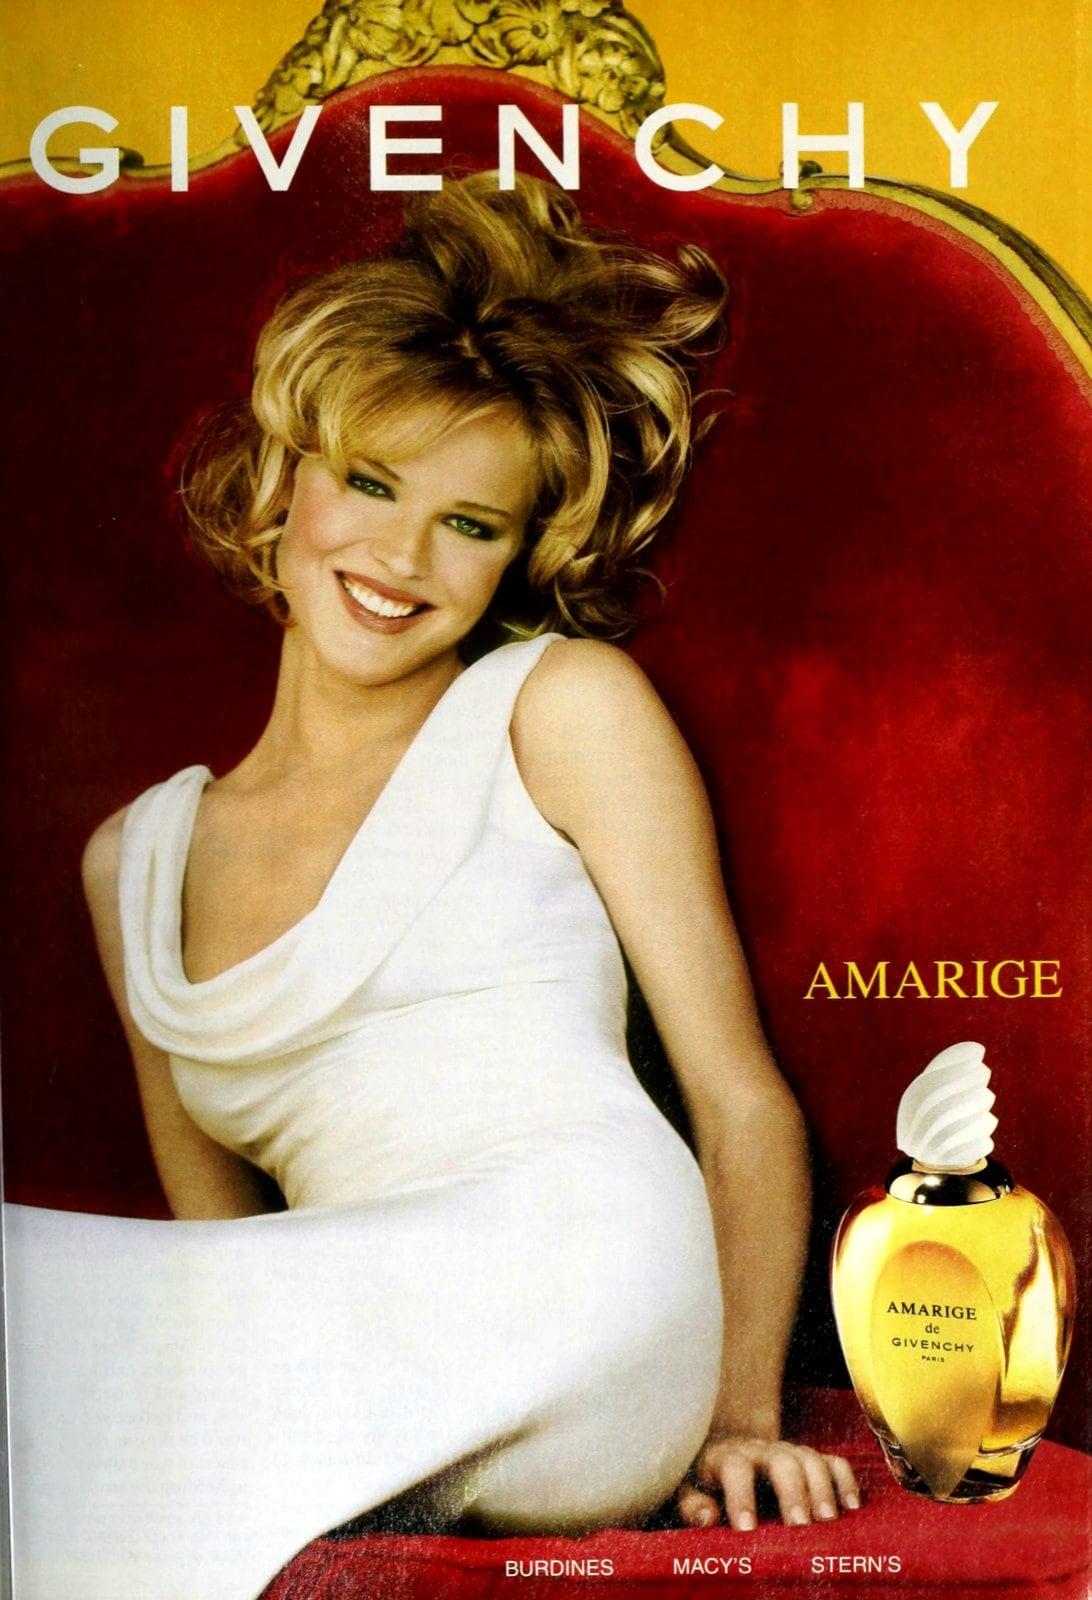 Amarige by Givenchy (1998) at ClickAmericana.com